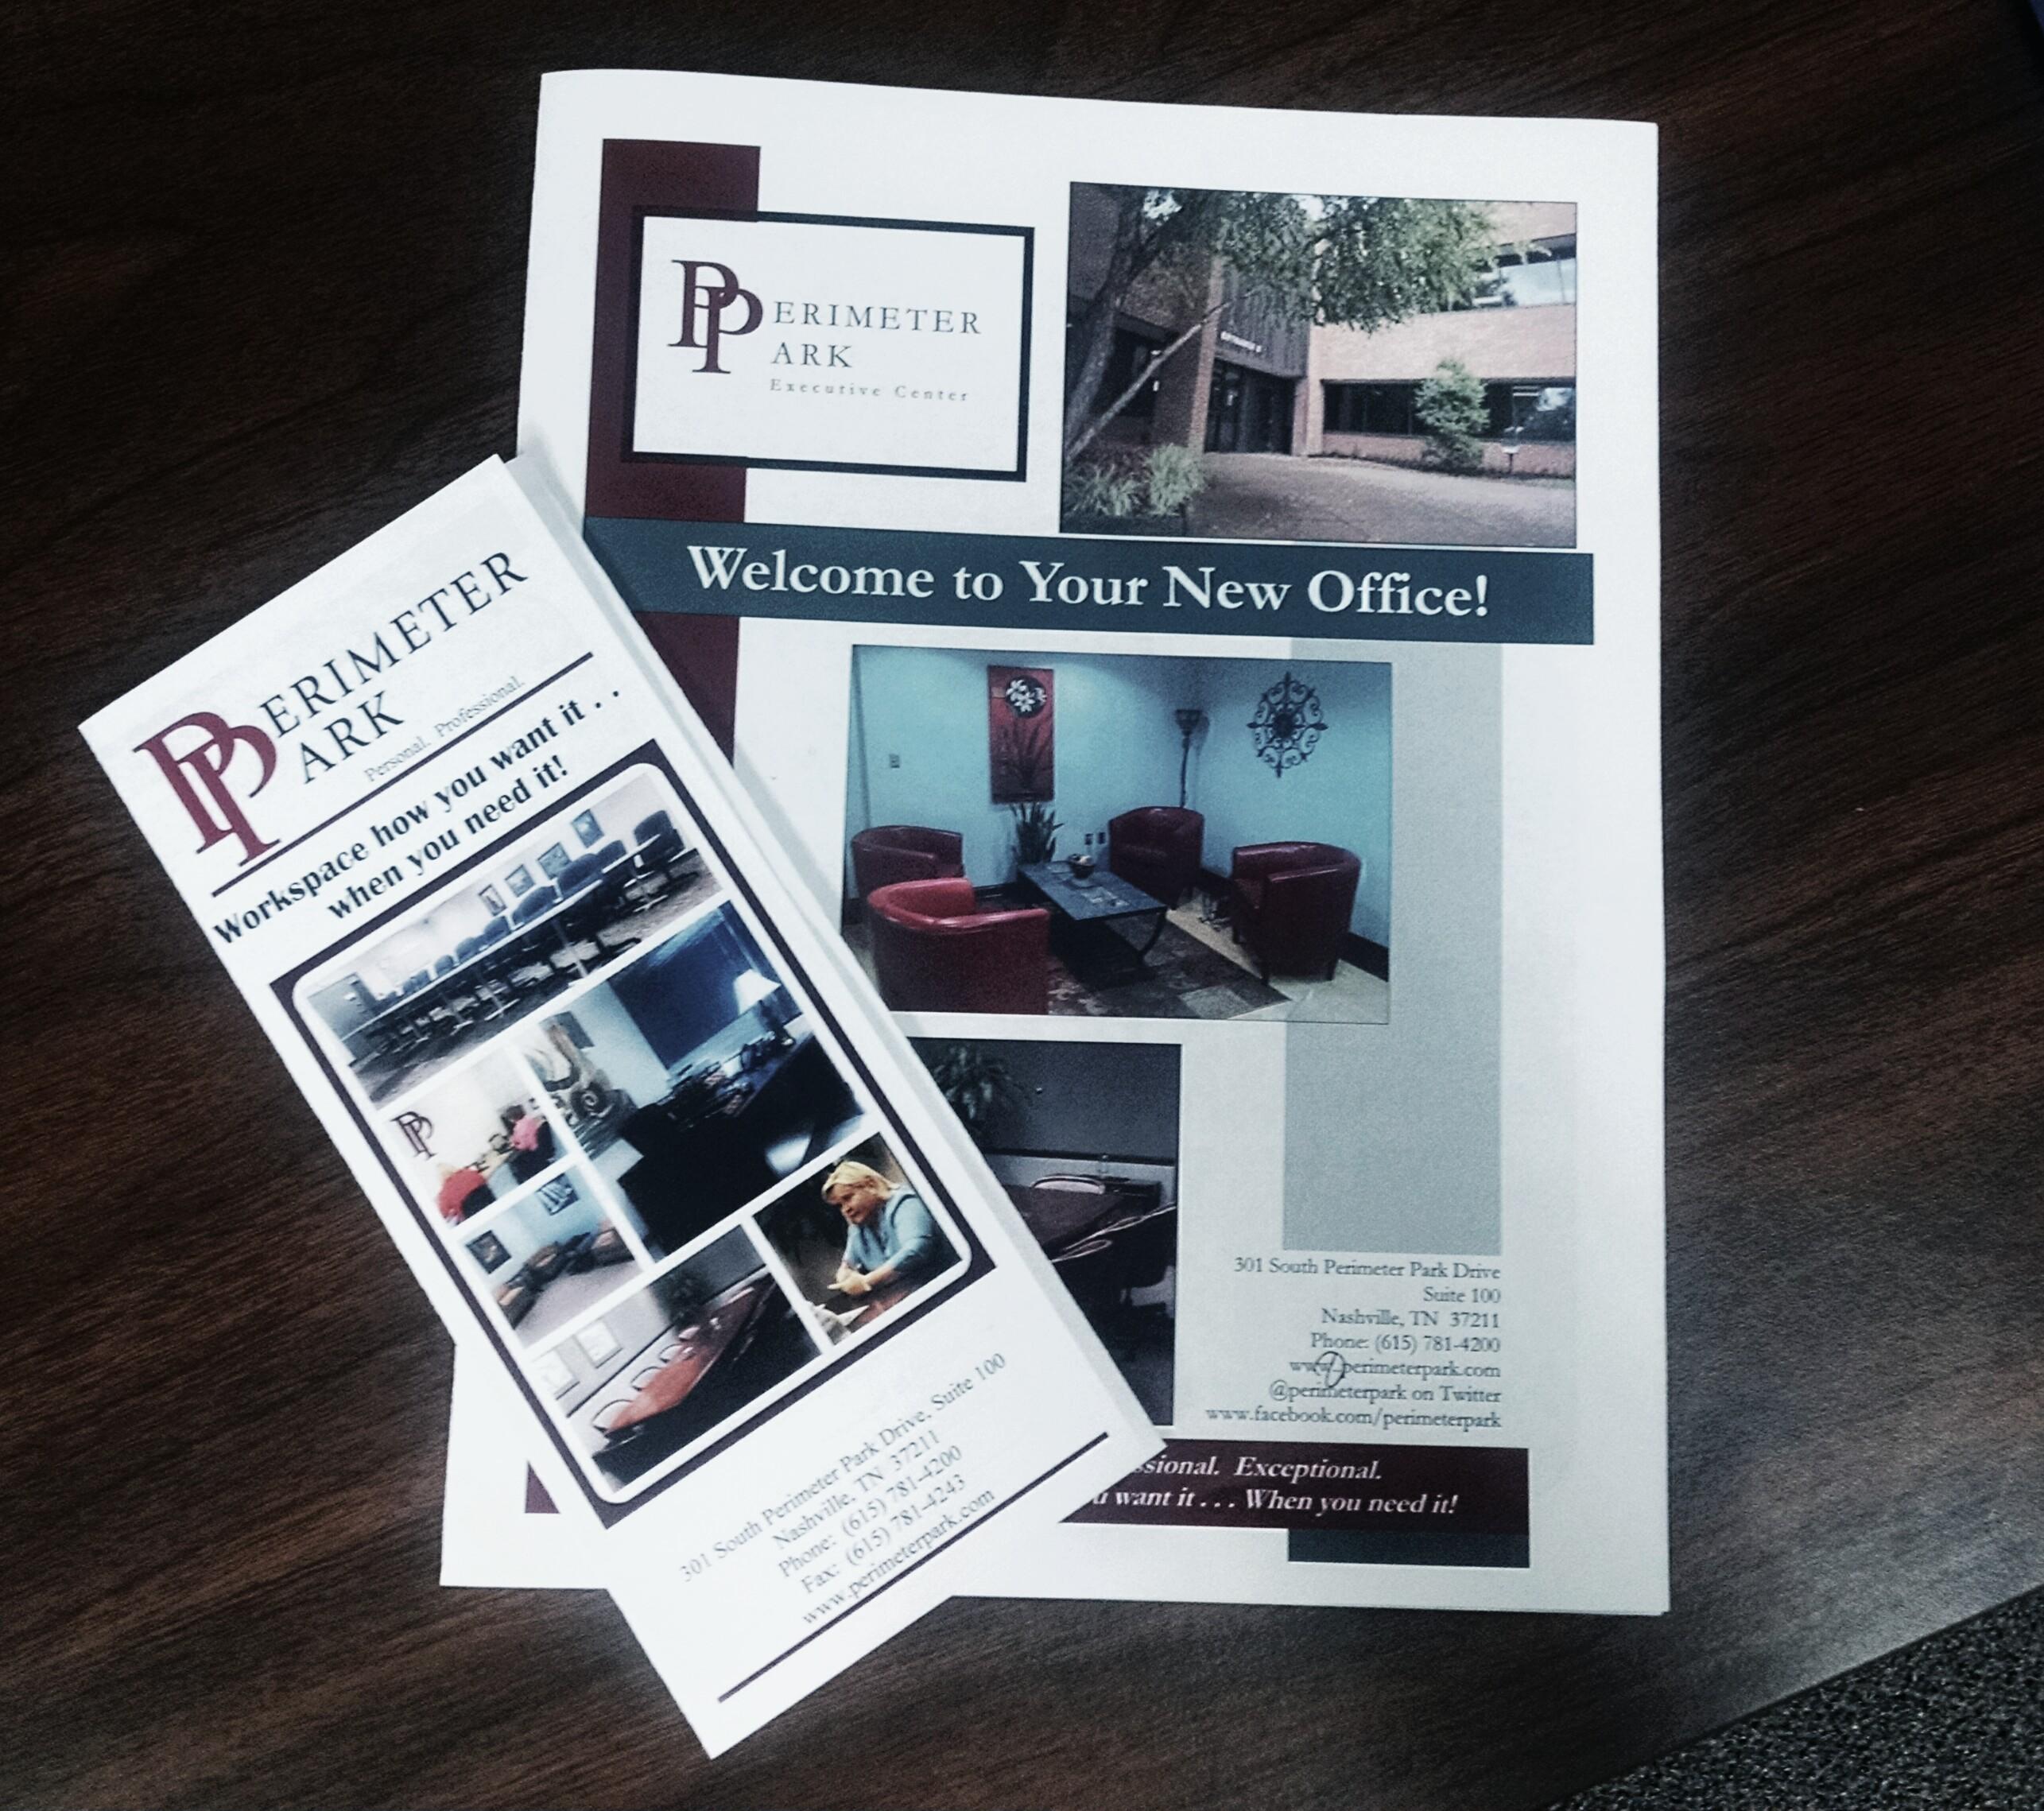 Nashville Business Services - Printing Services